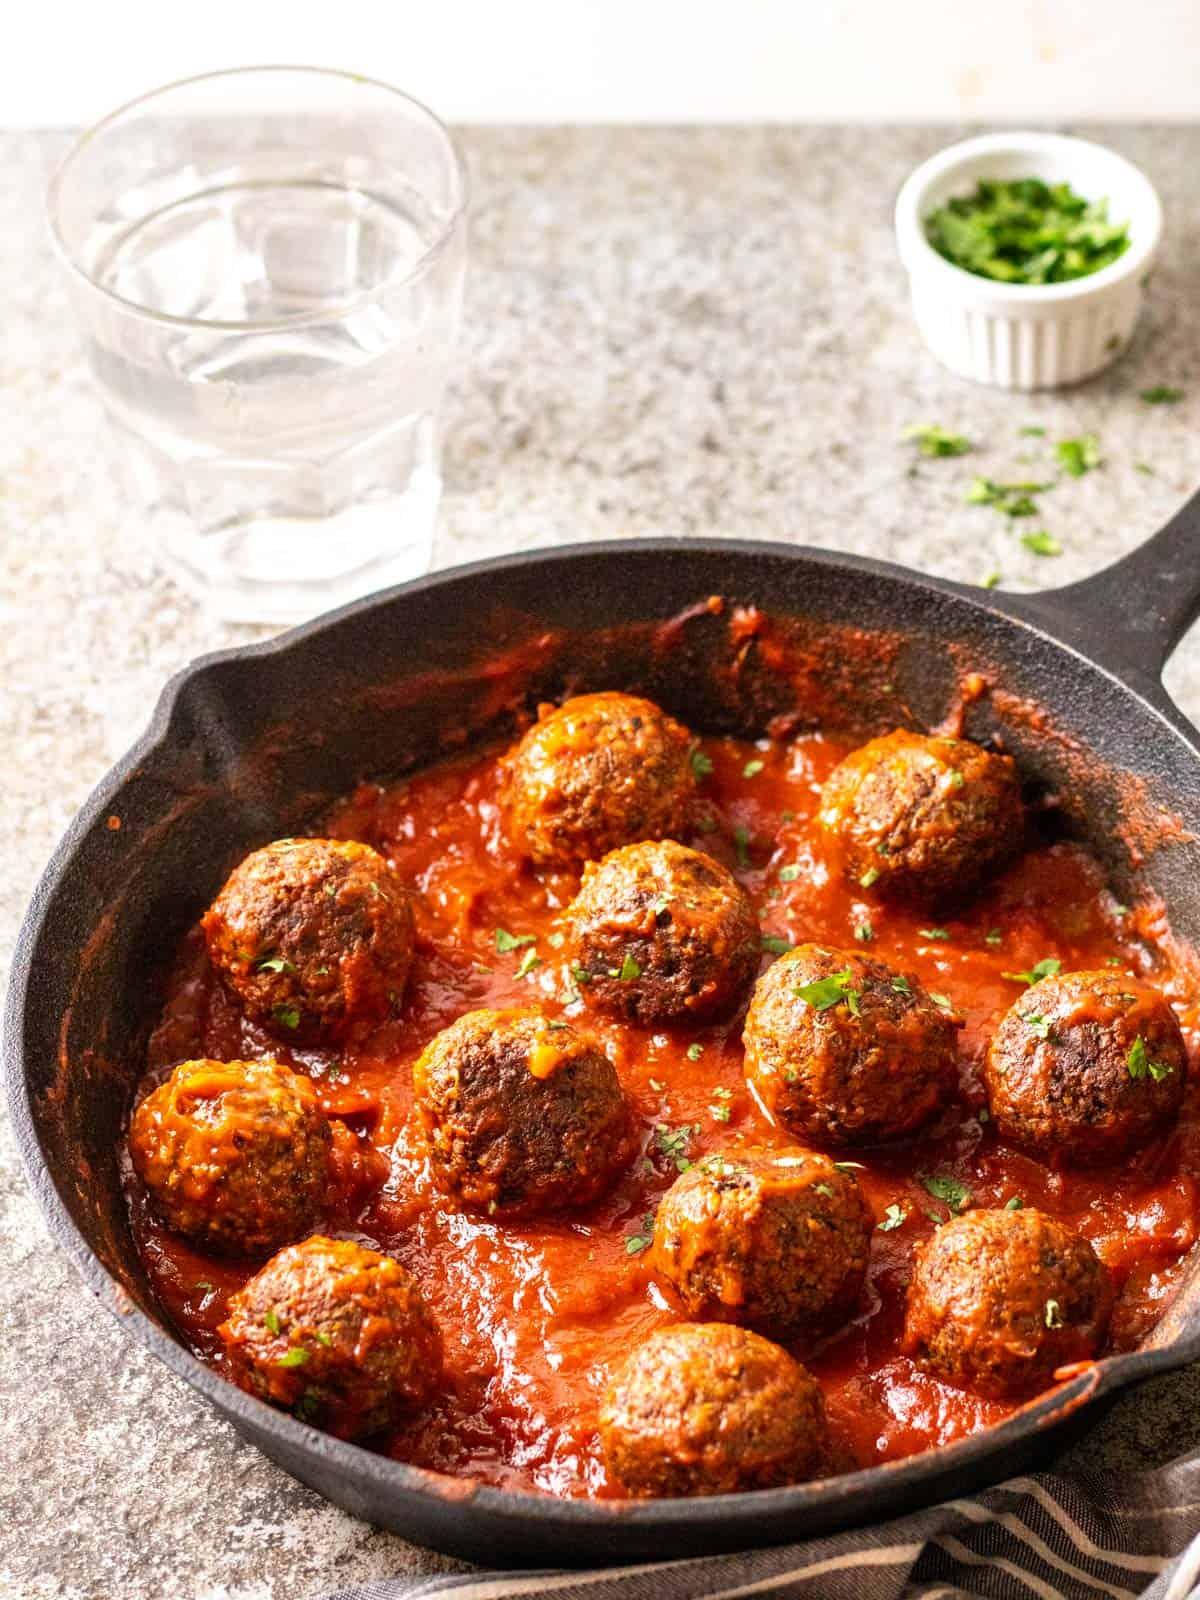 A close up of vegan tvp meatballs in a cast iron pan.